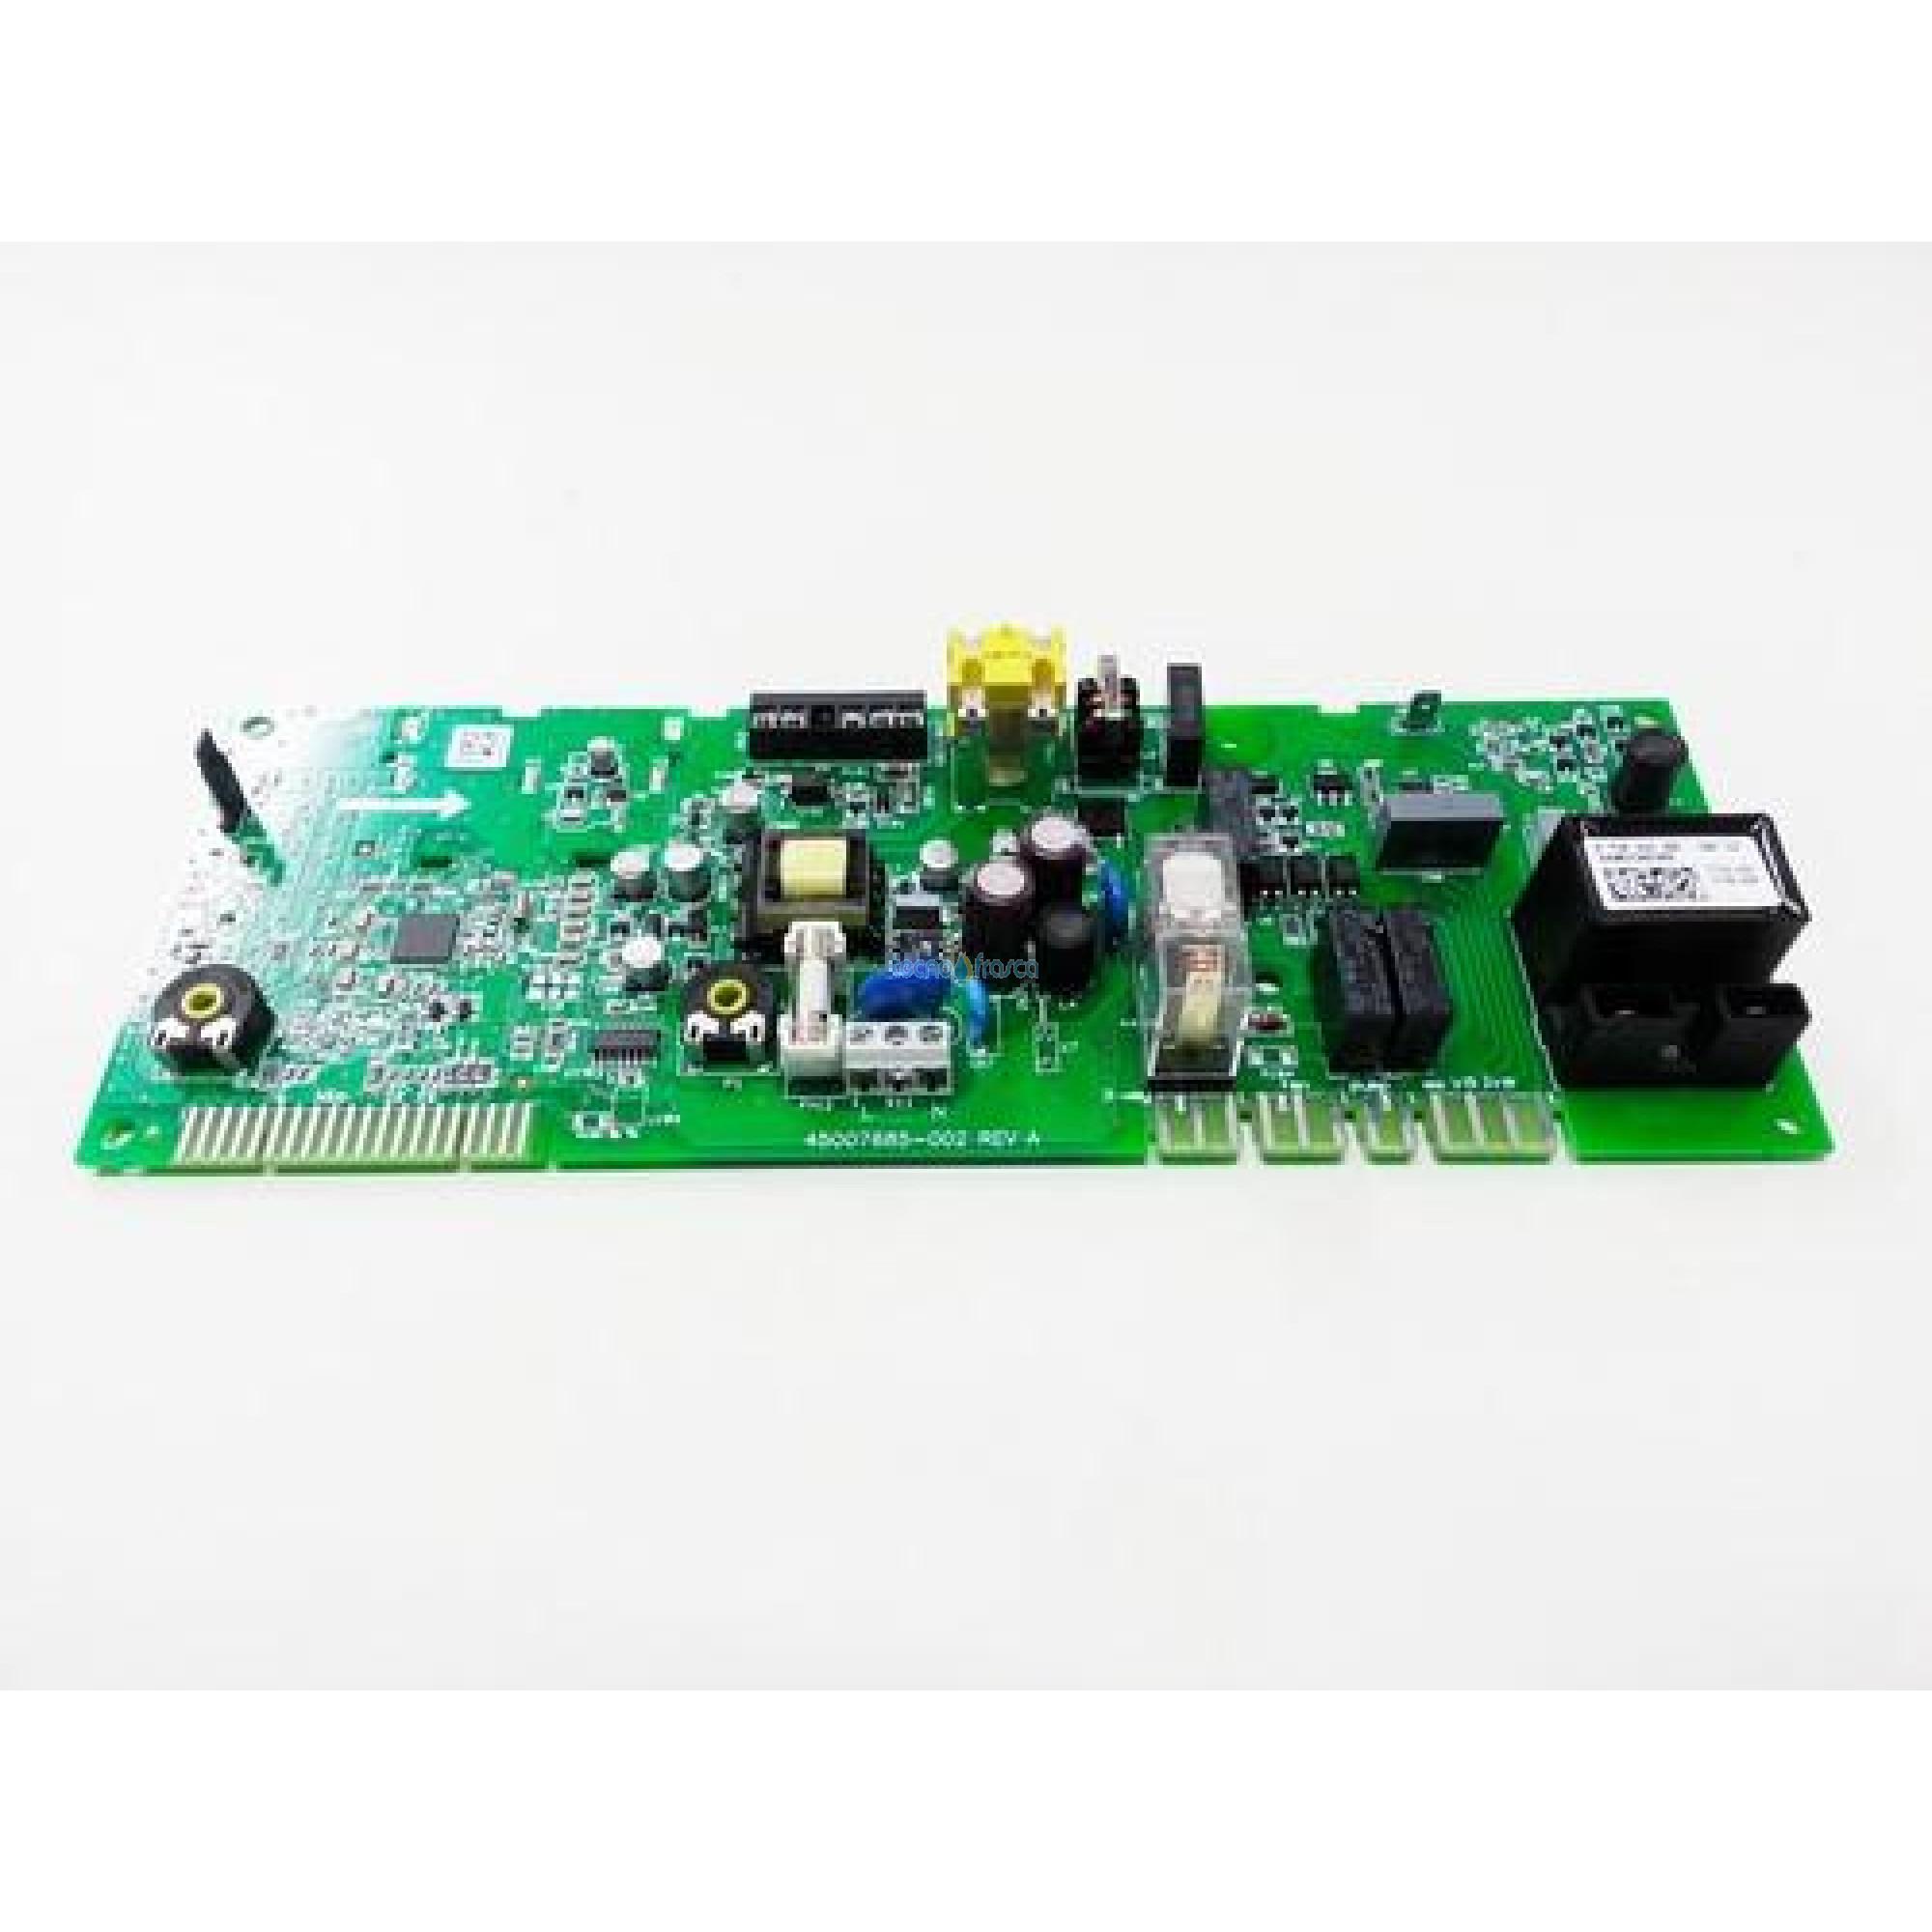 Junkers bosch scheda elettronica ceraclas s4962cm2069 8708300292